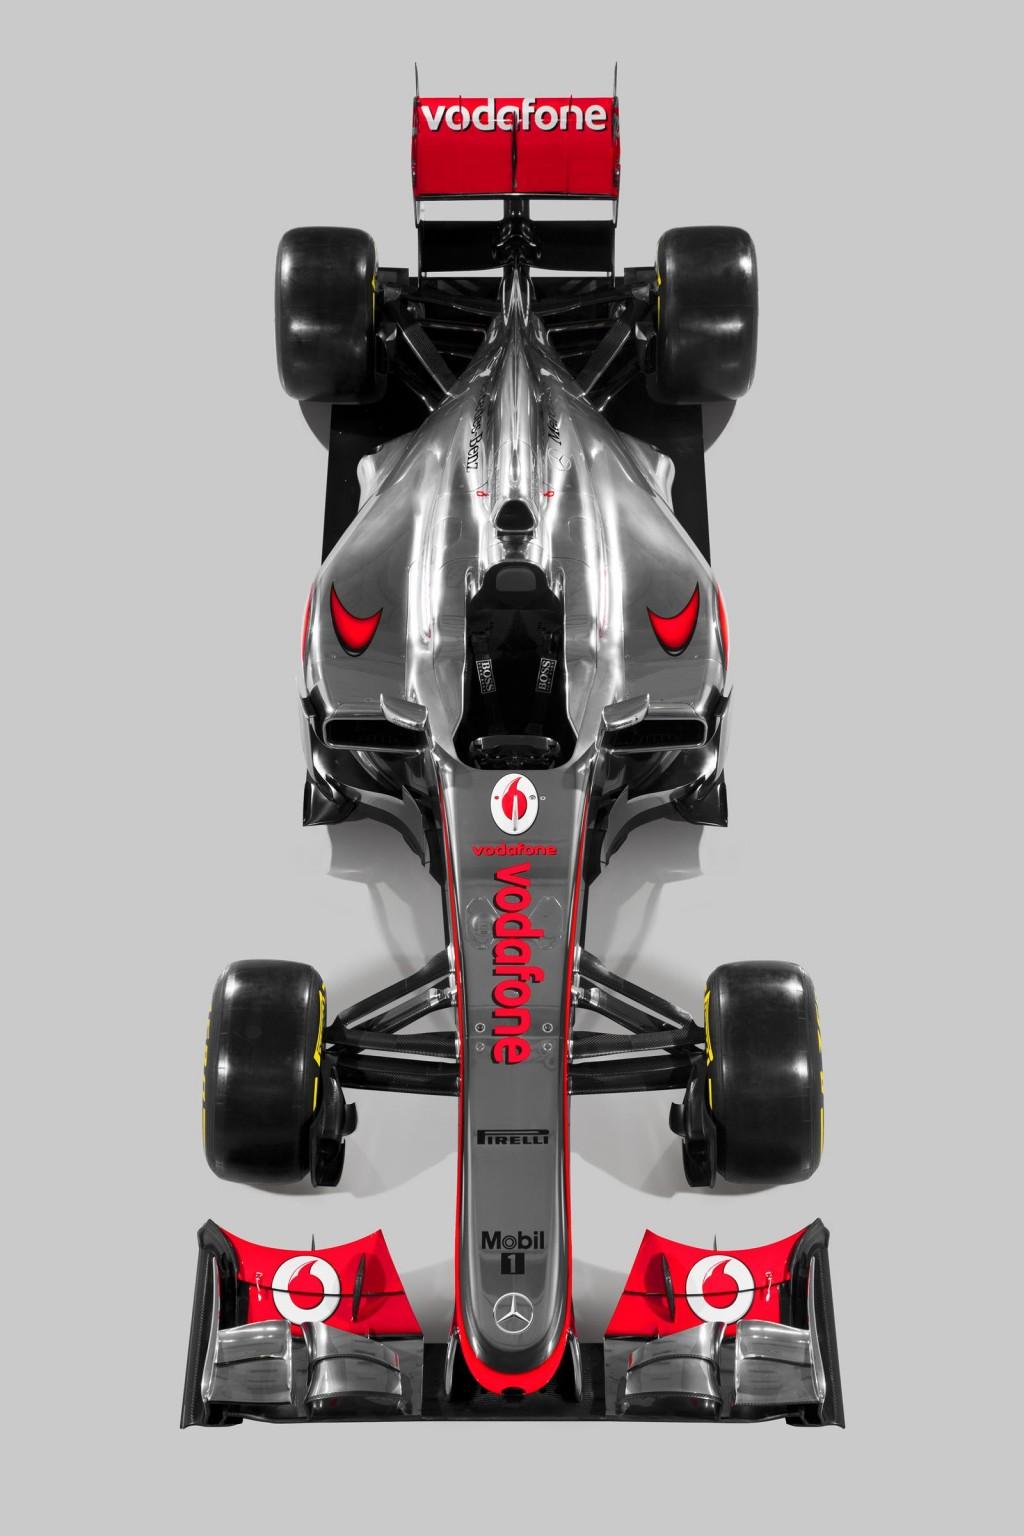 2012_mclaren_mp4_27_f1_race_car_04